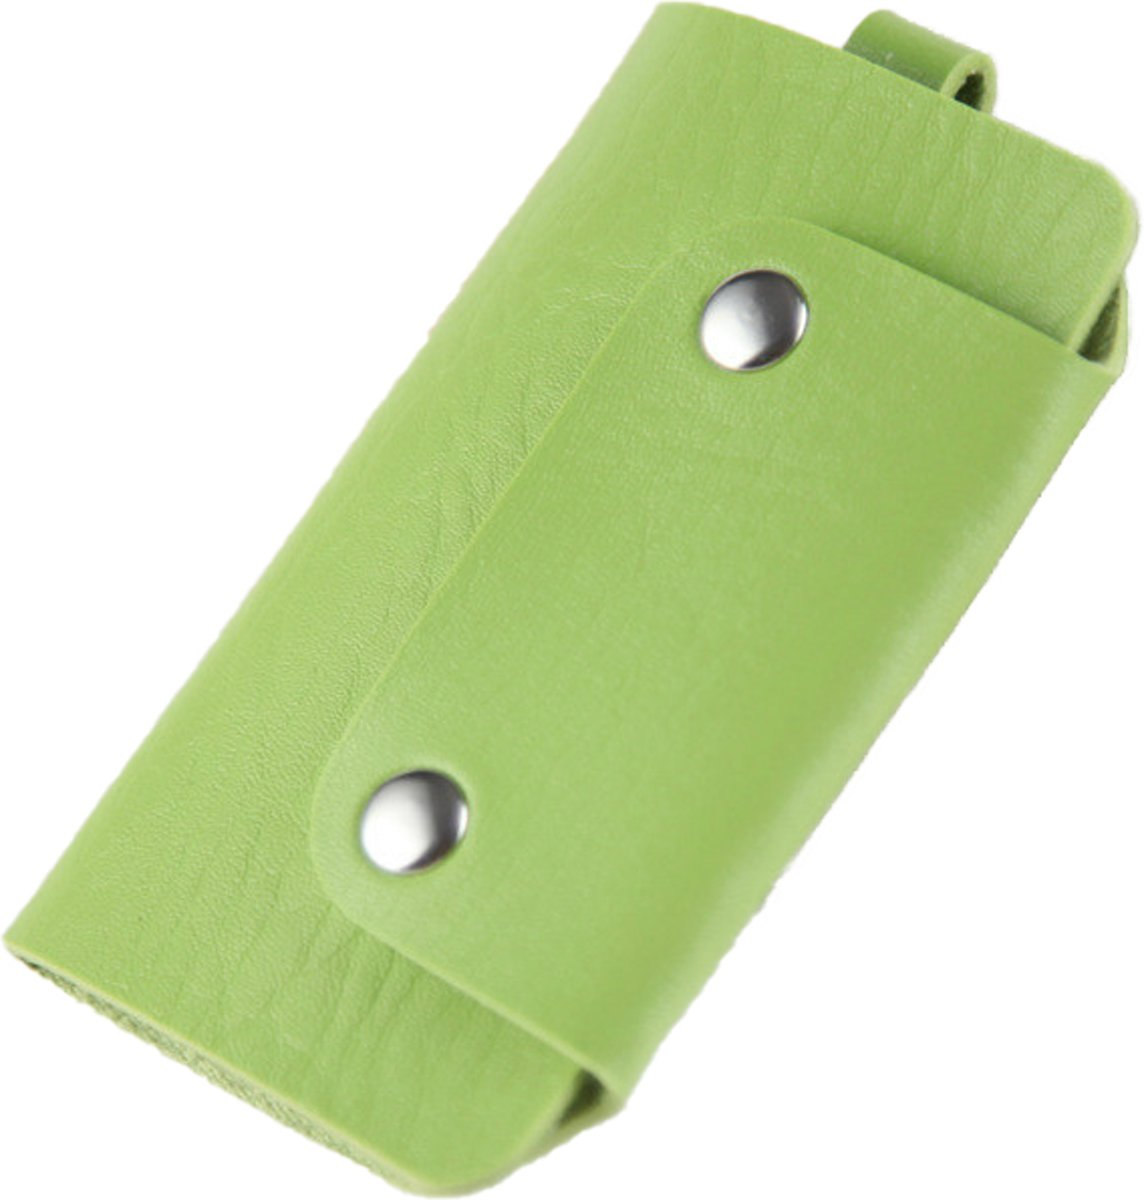 ZILOU Sleuteletui - Sleuteltasje - Key Wallet Compact - Kunstleer - Groen kopen